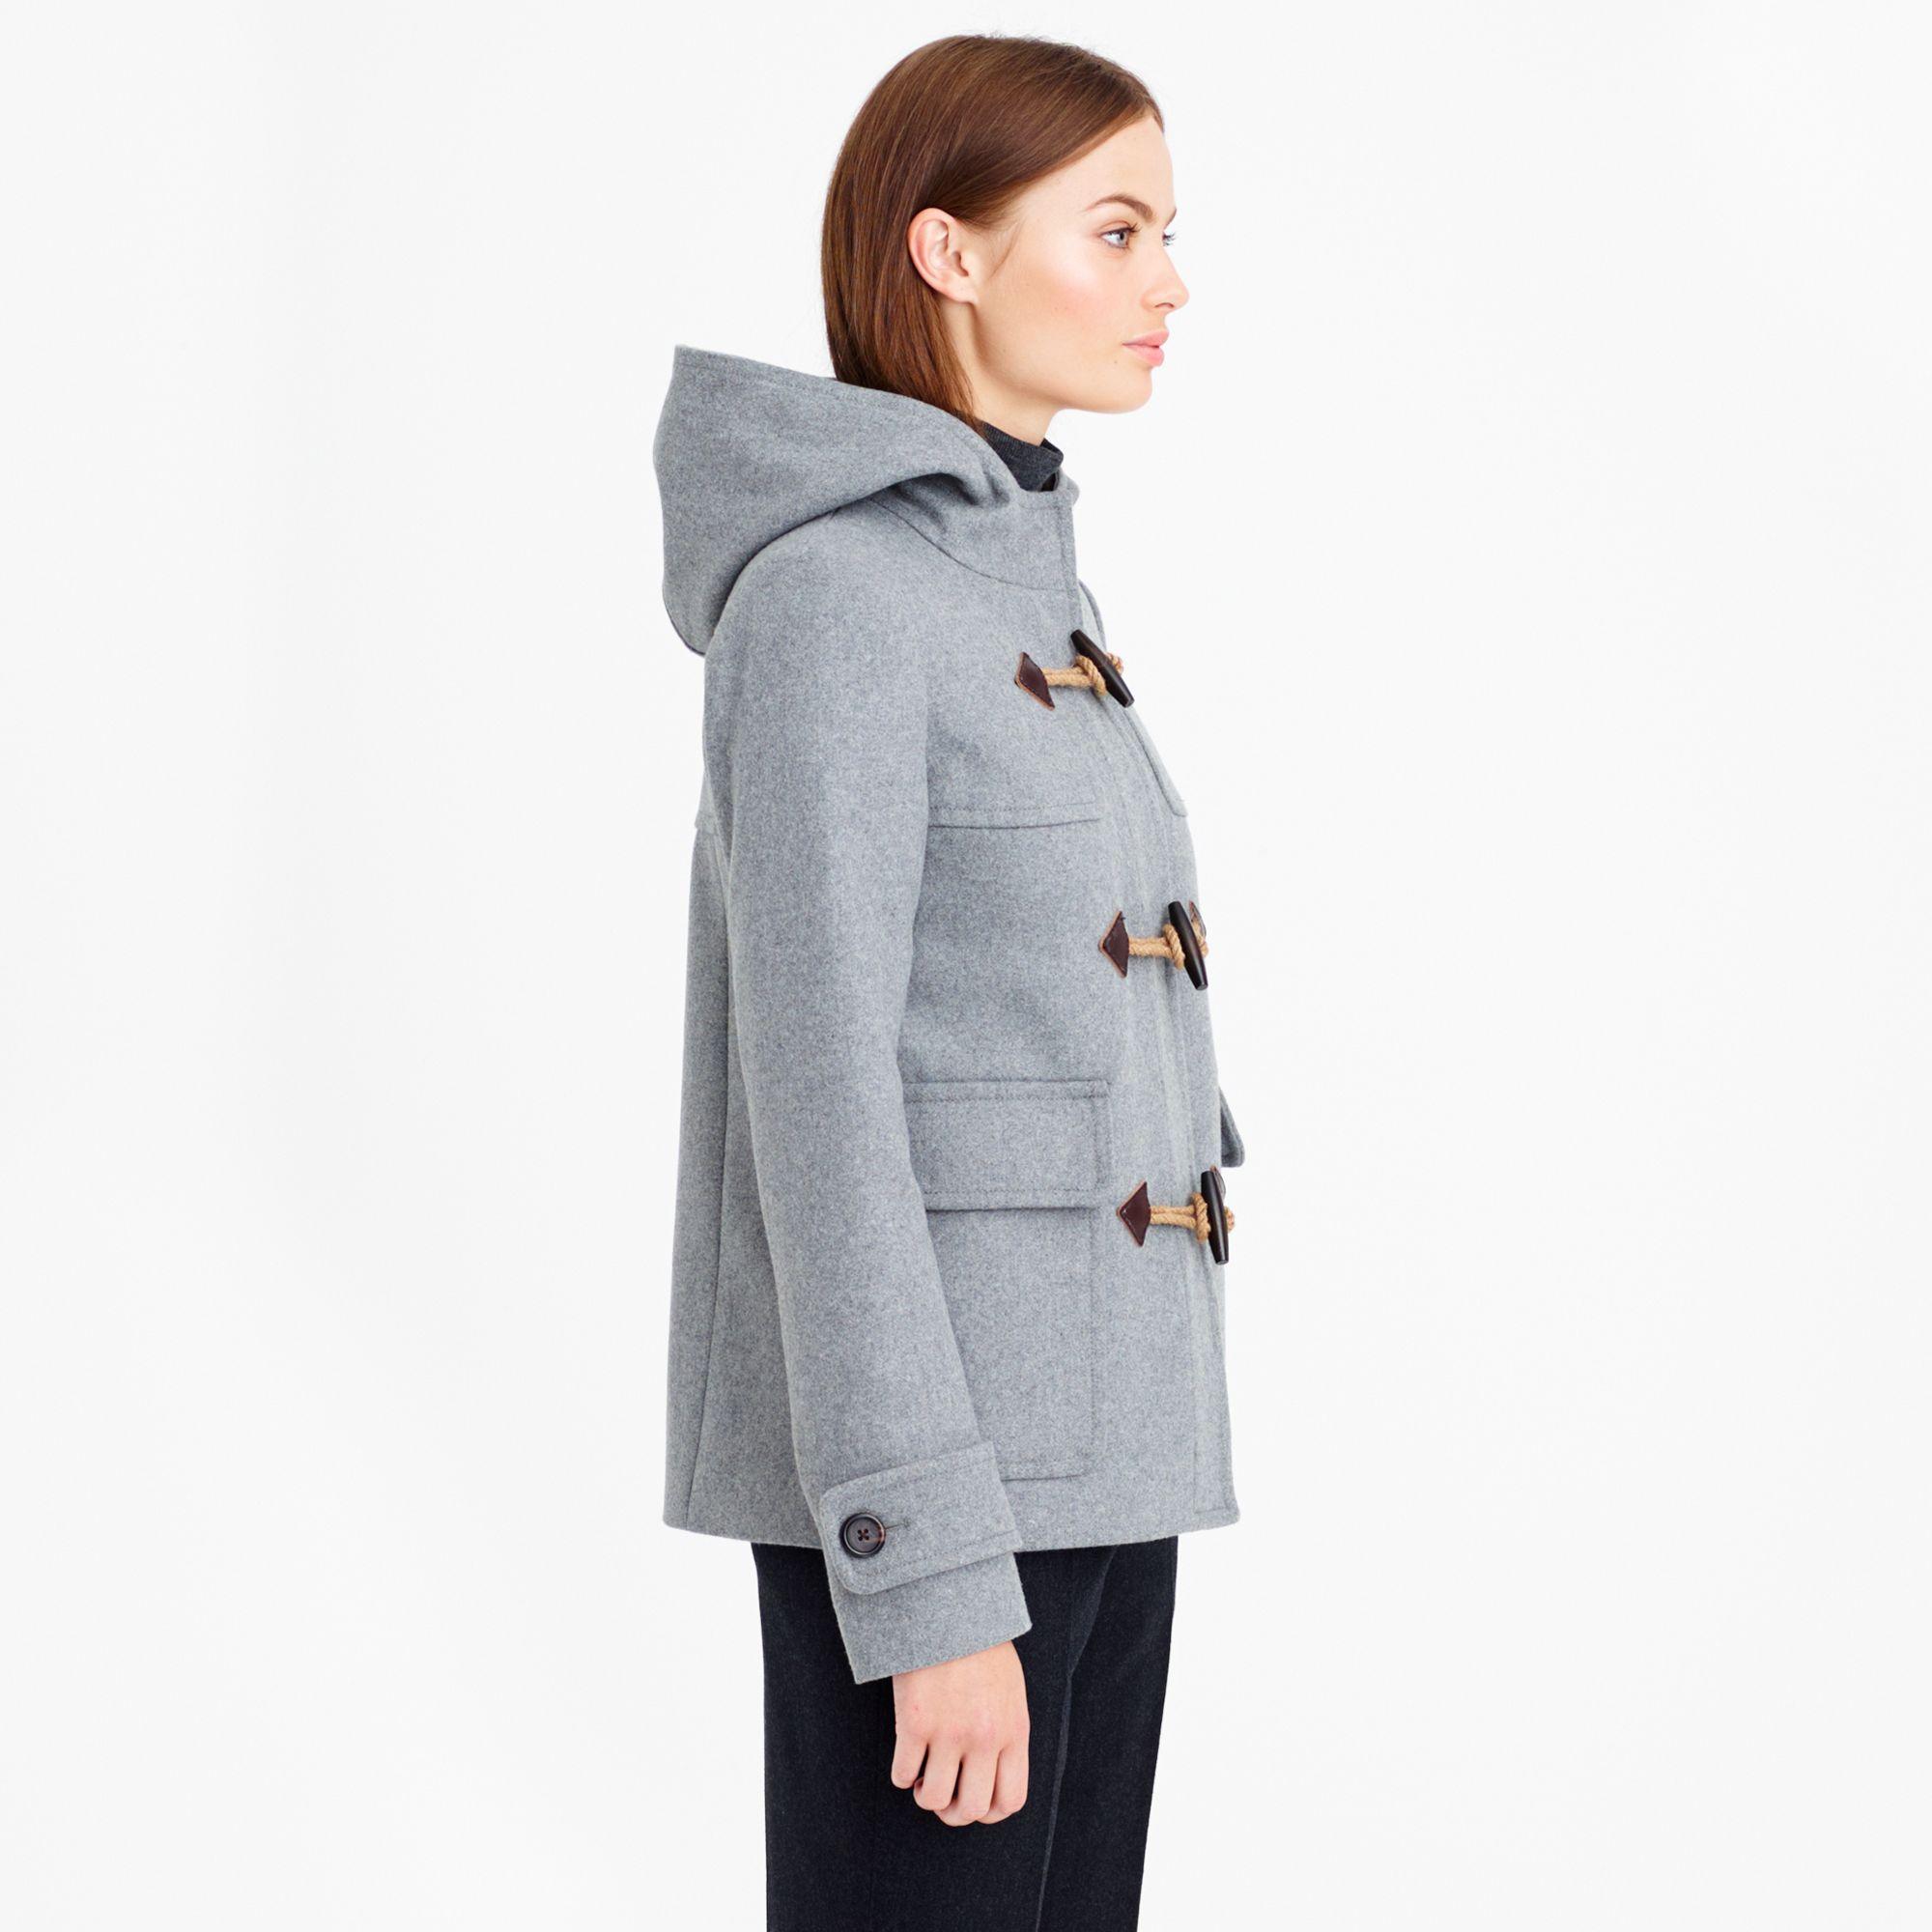 J.crew Classic Duffle Coat in Gray | Lyst